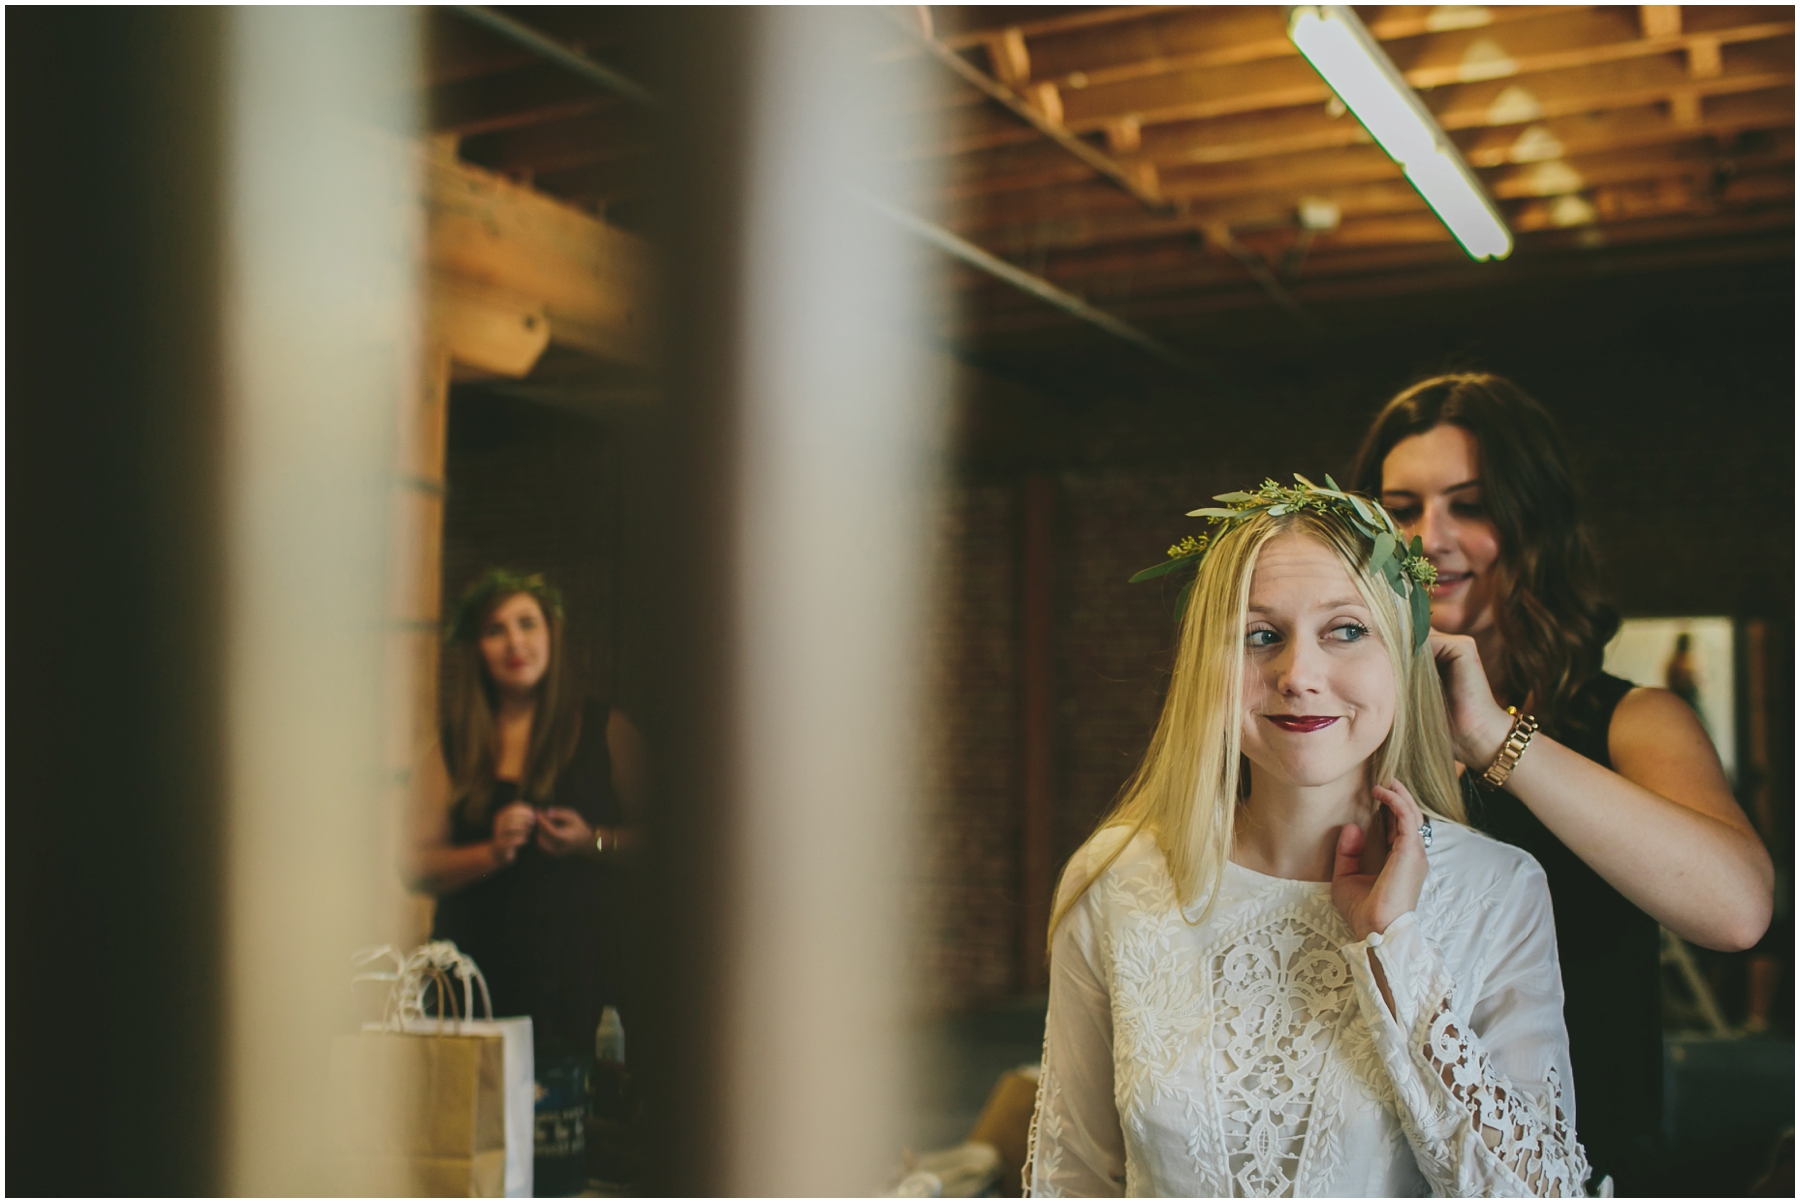 Natalie+Corey-WEDDING_KELLYBOITANO_0010